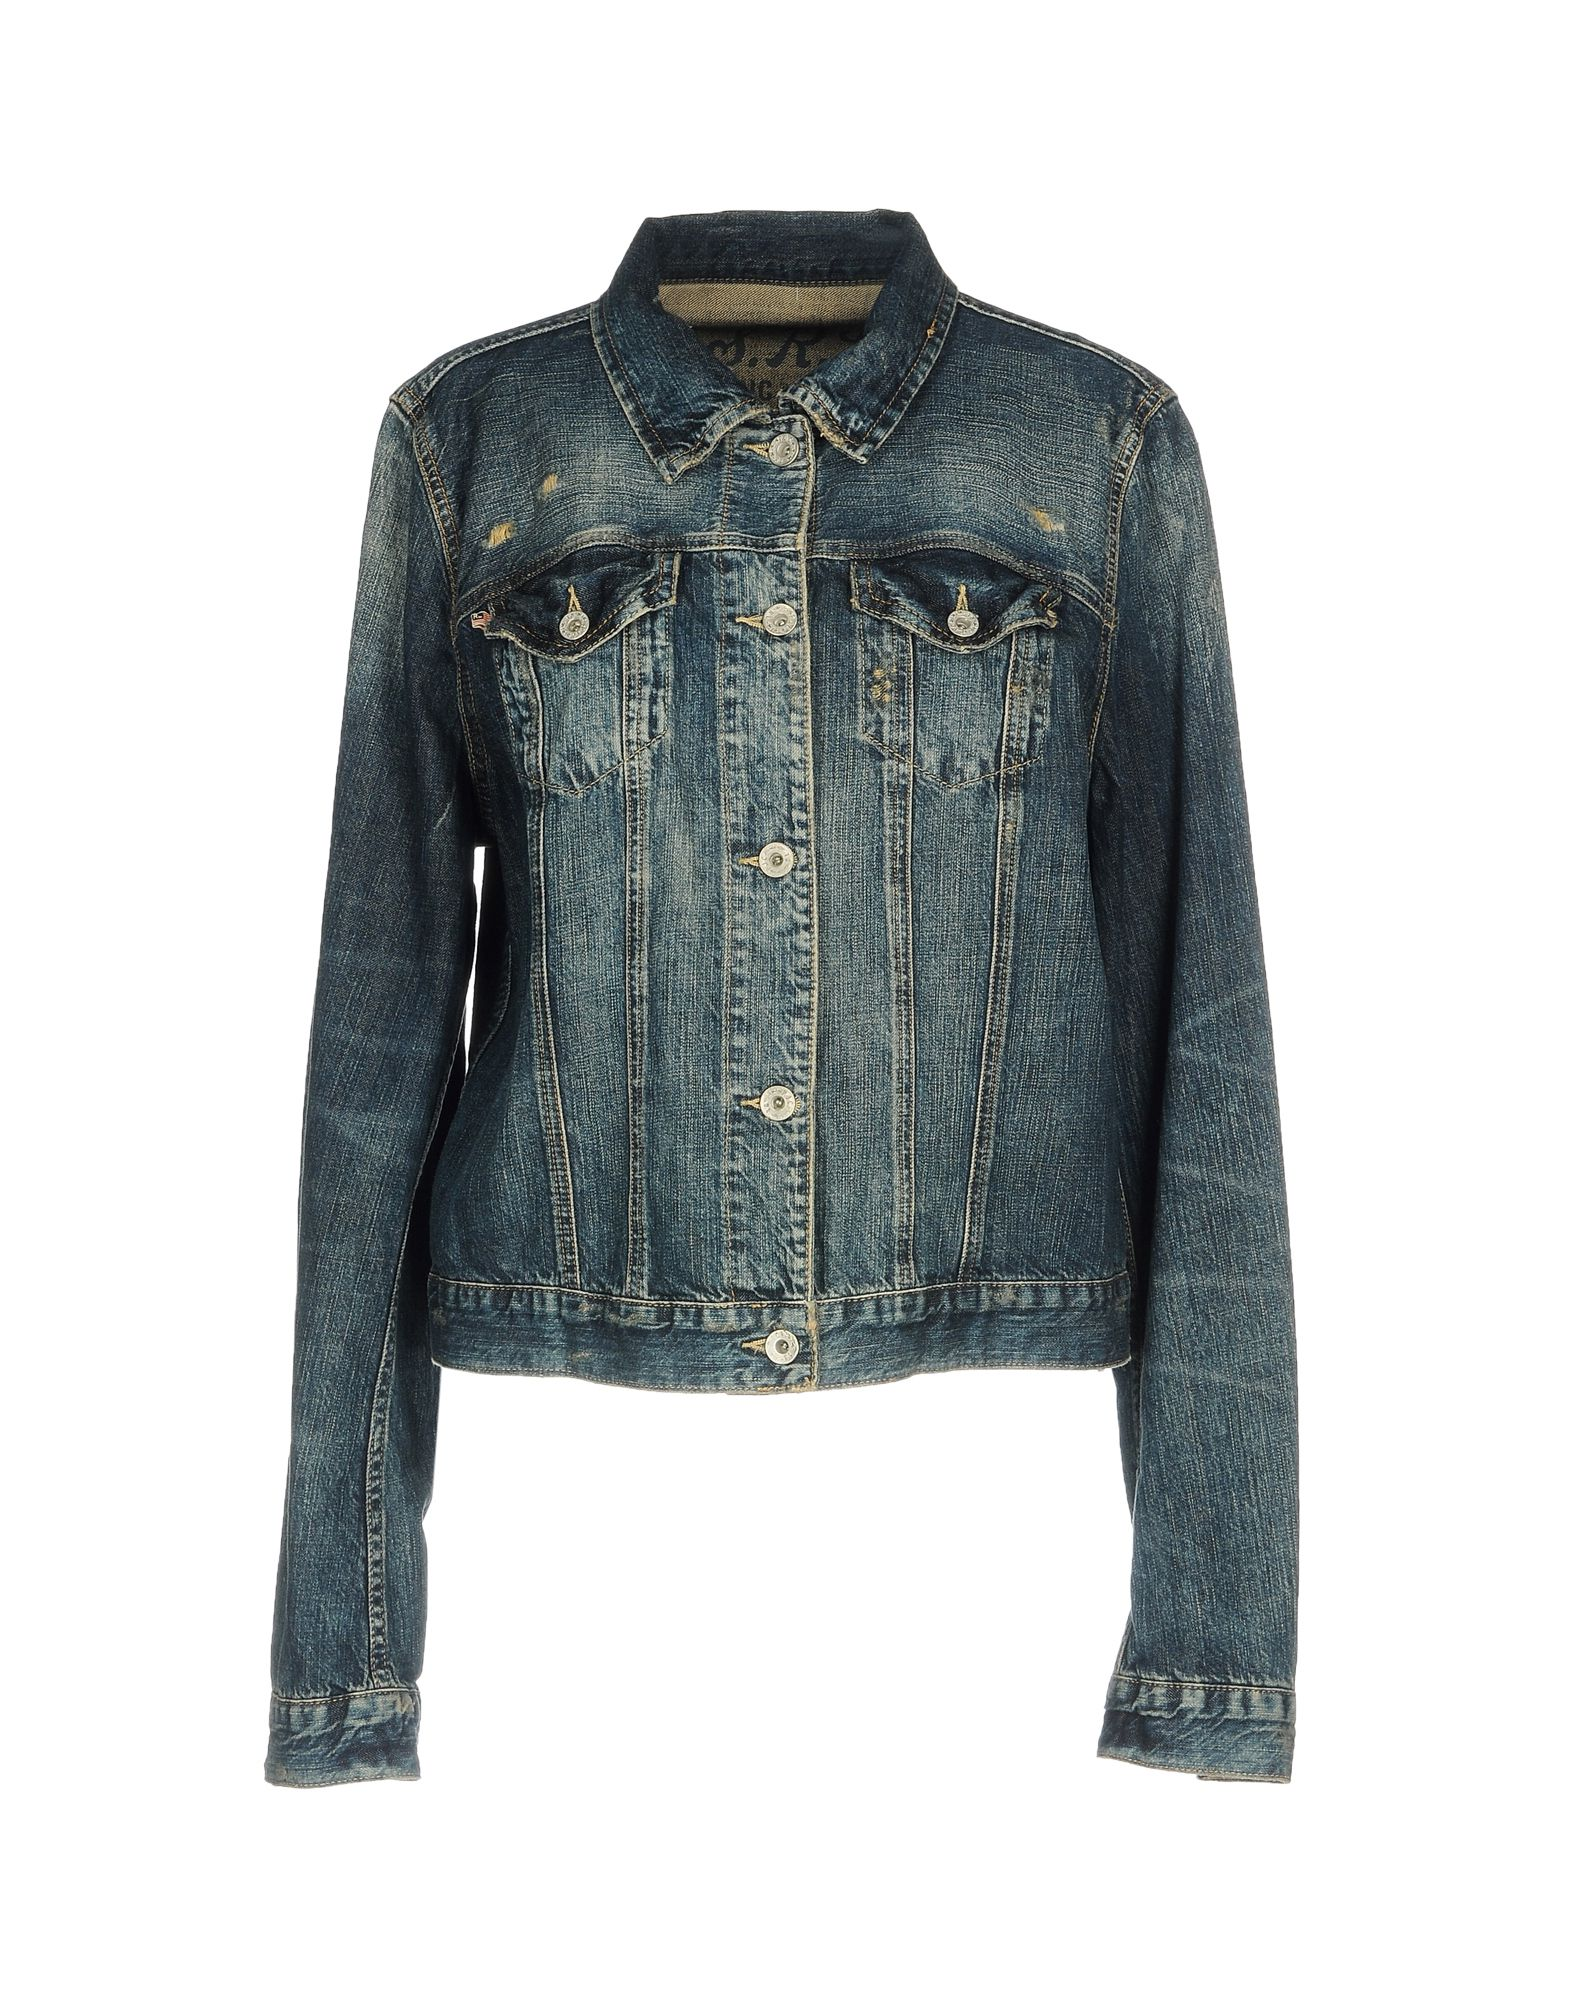 POLO JEANS COMPANY Джинсовая верхняя одежда polo jeans company сумка на руку